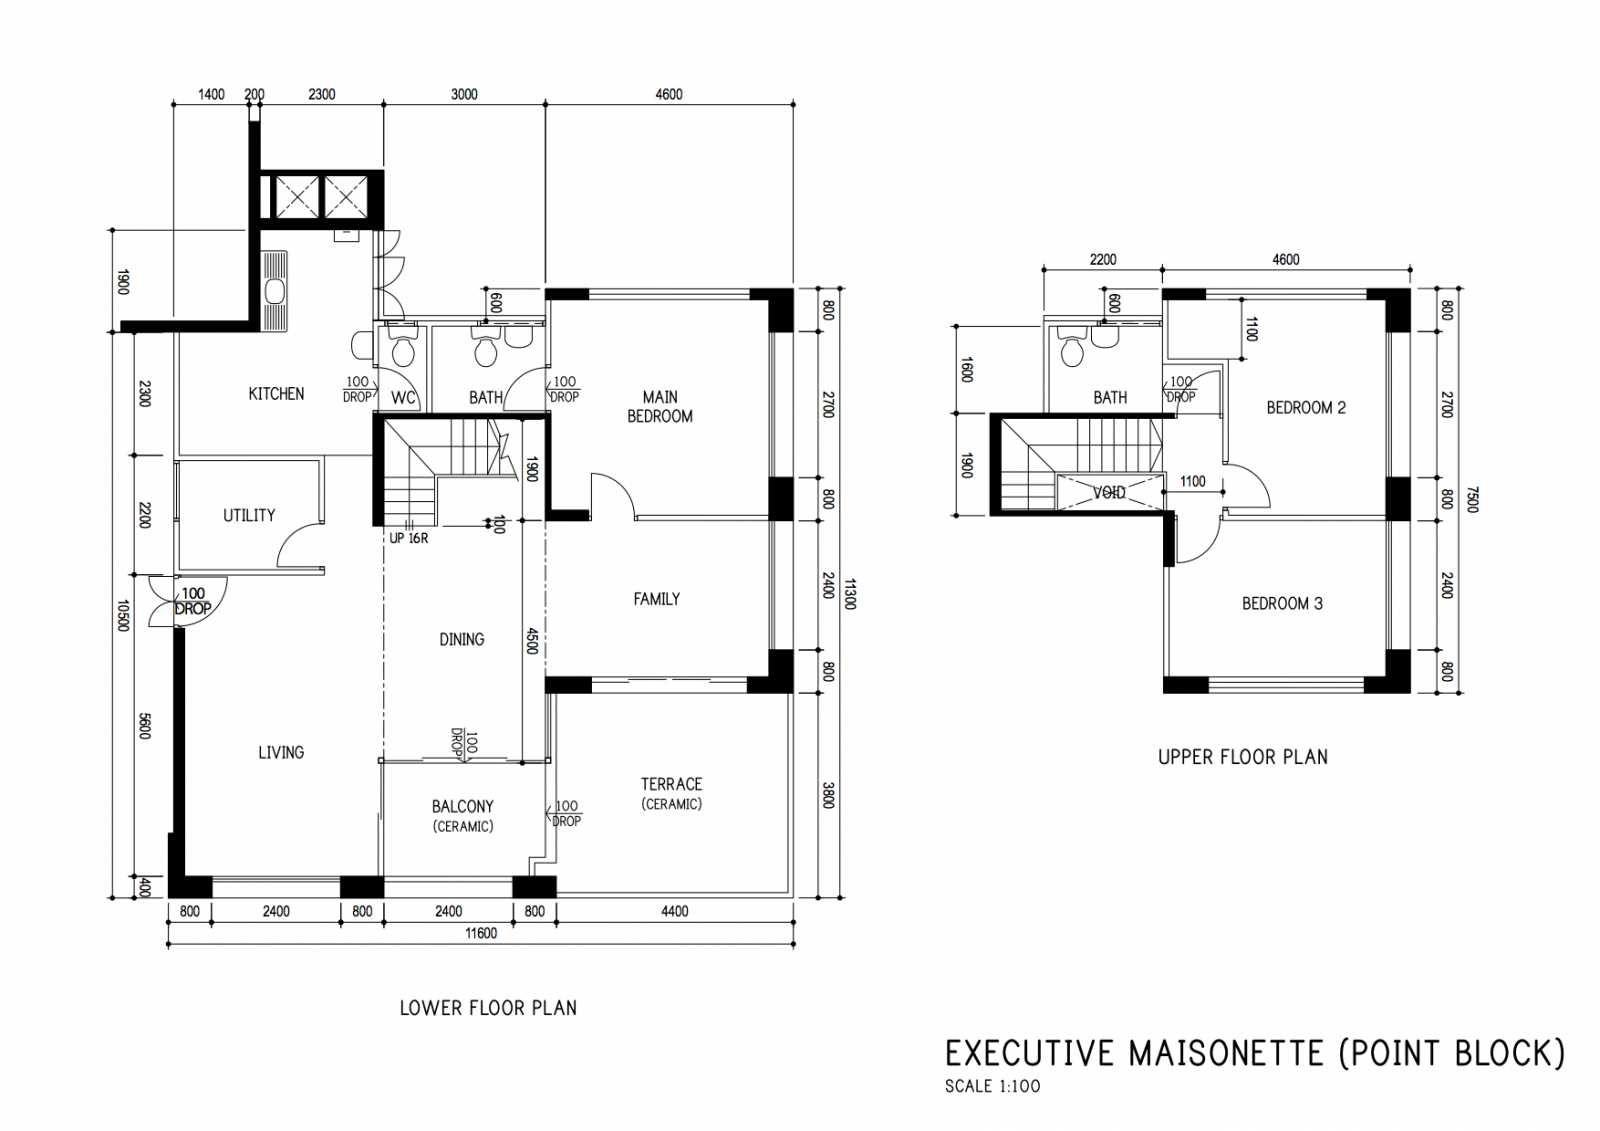 Hdb Executive Maisonette From Bishan Blocks 1xx 163 Sqm Floor Plans How To Plan Bishan